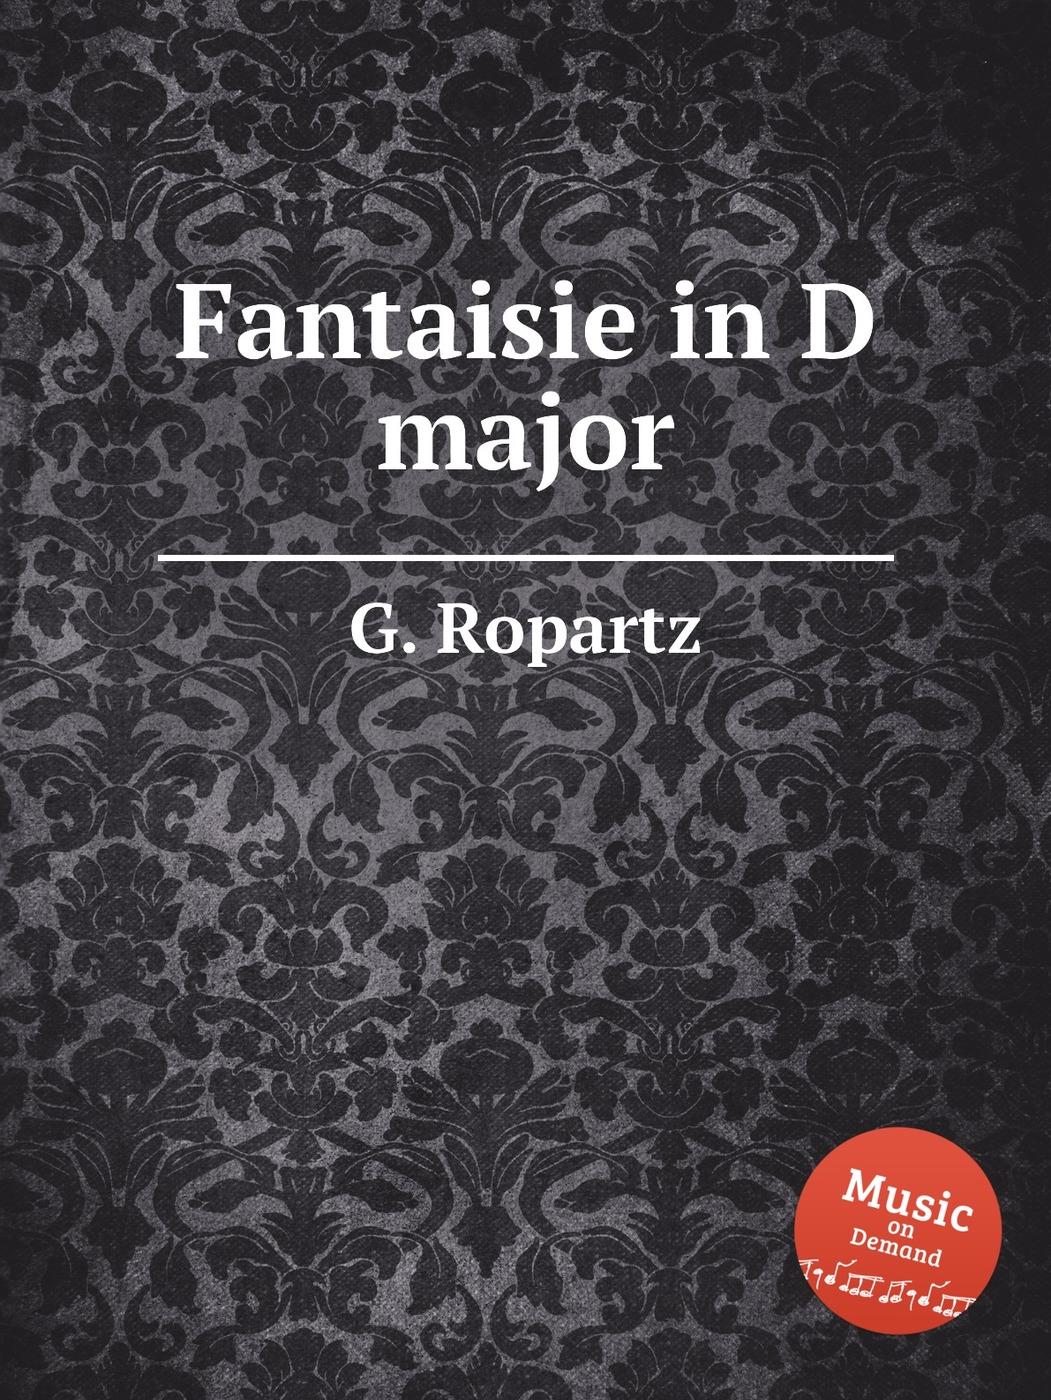 Fantaisie in D major 9785884858329